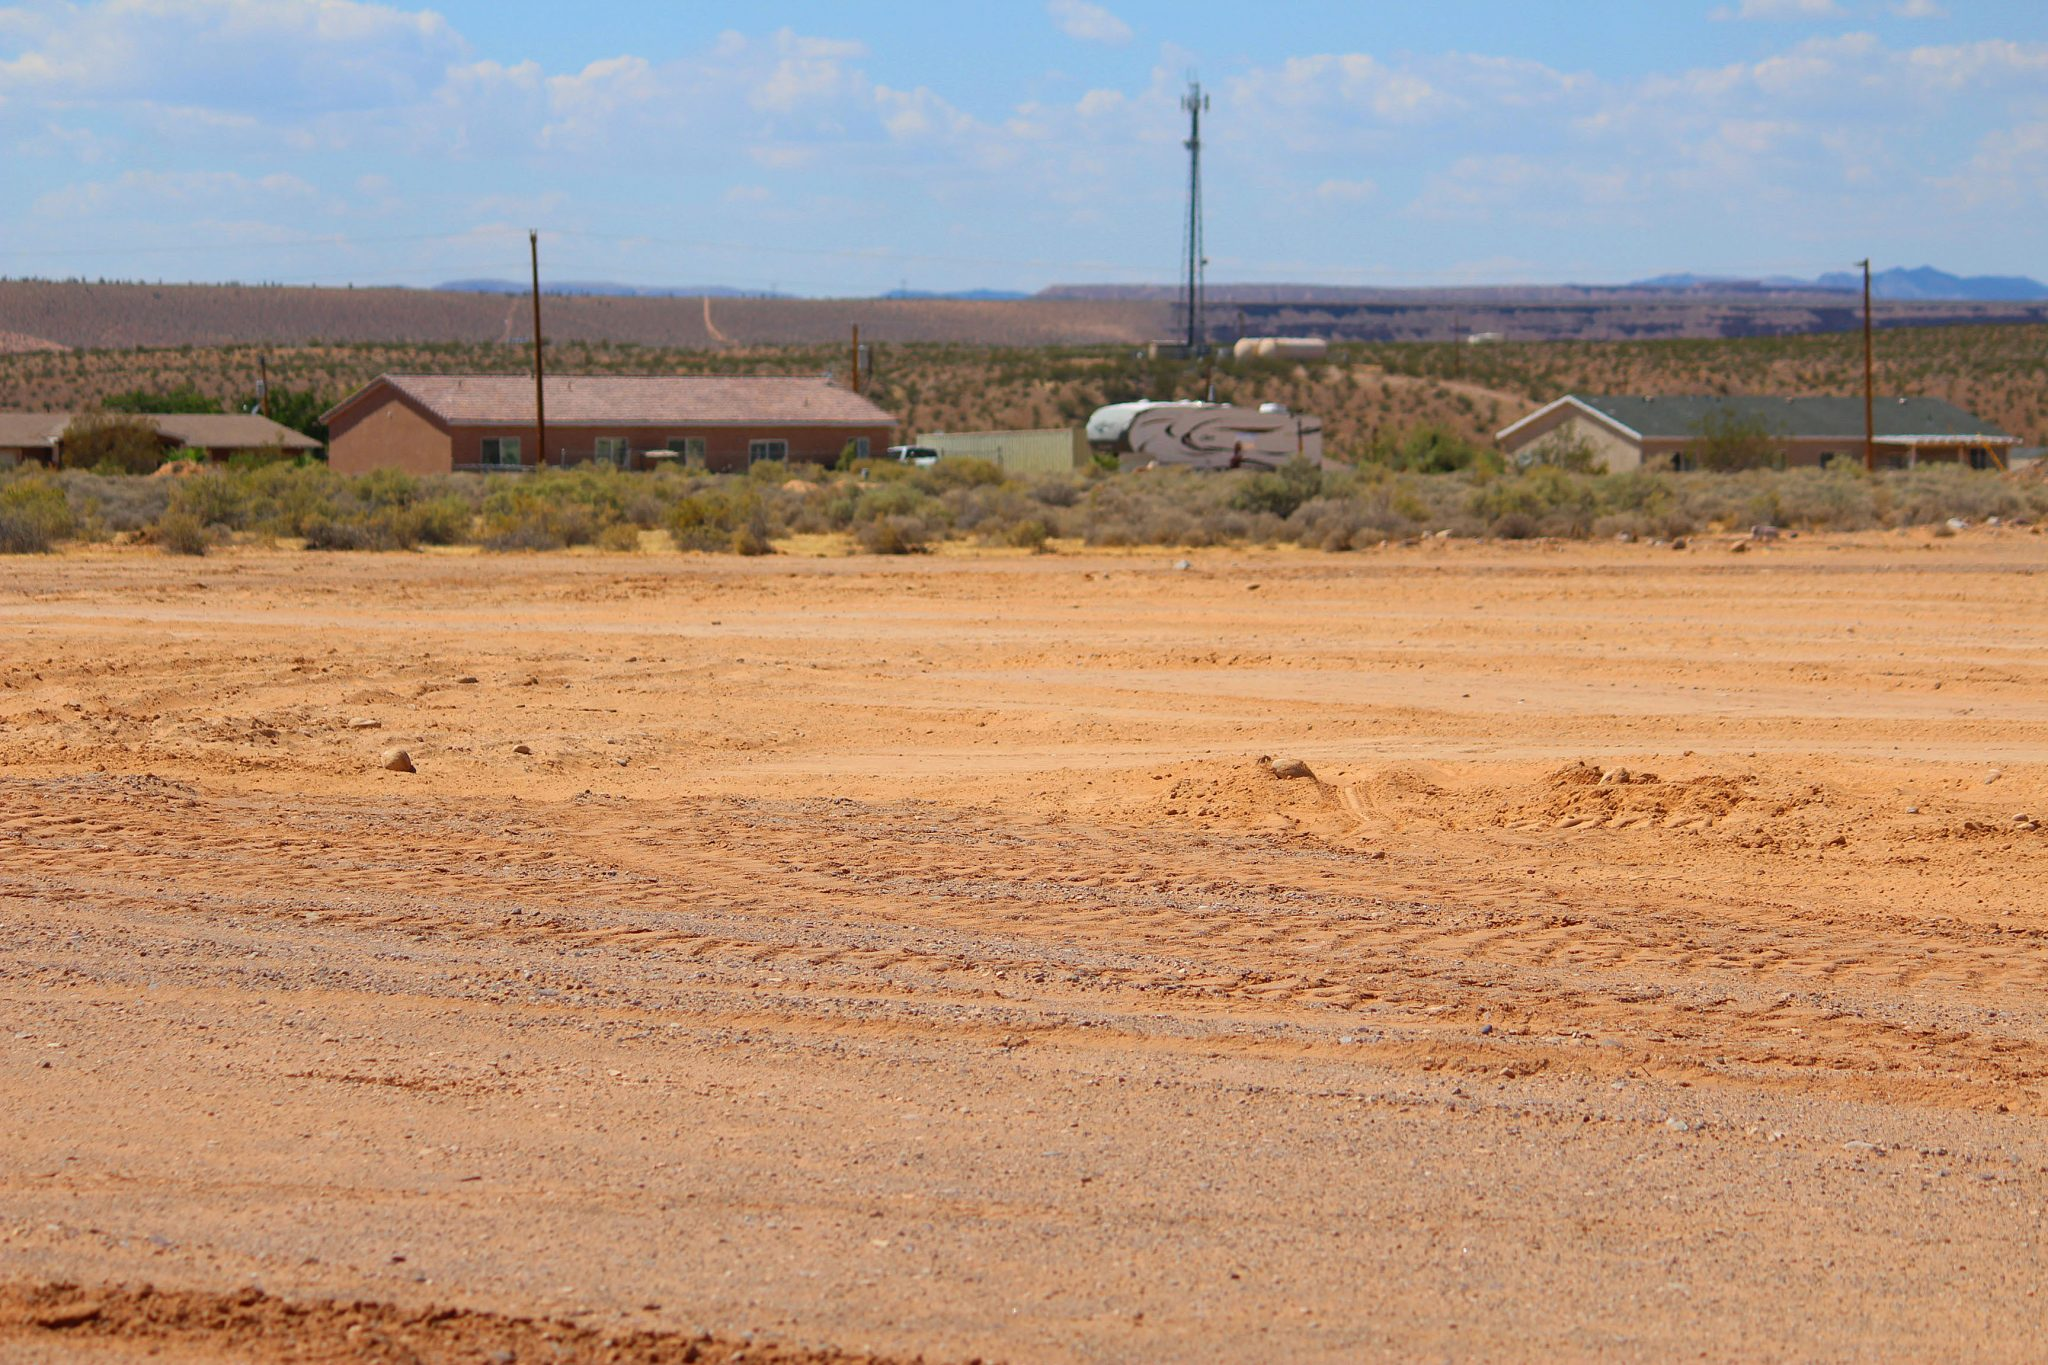 Desert Spring residents request rezoning